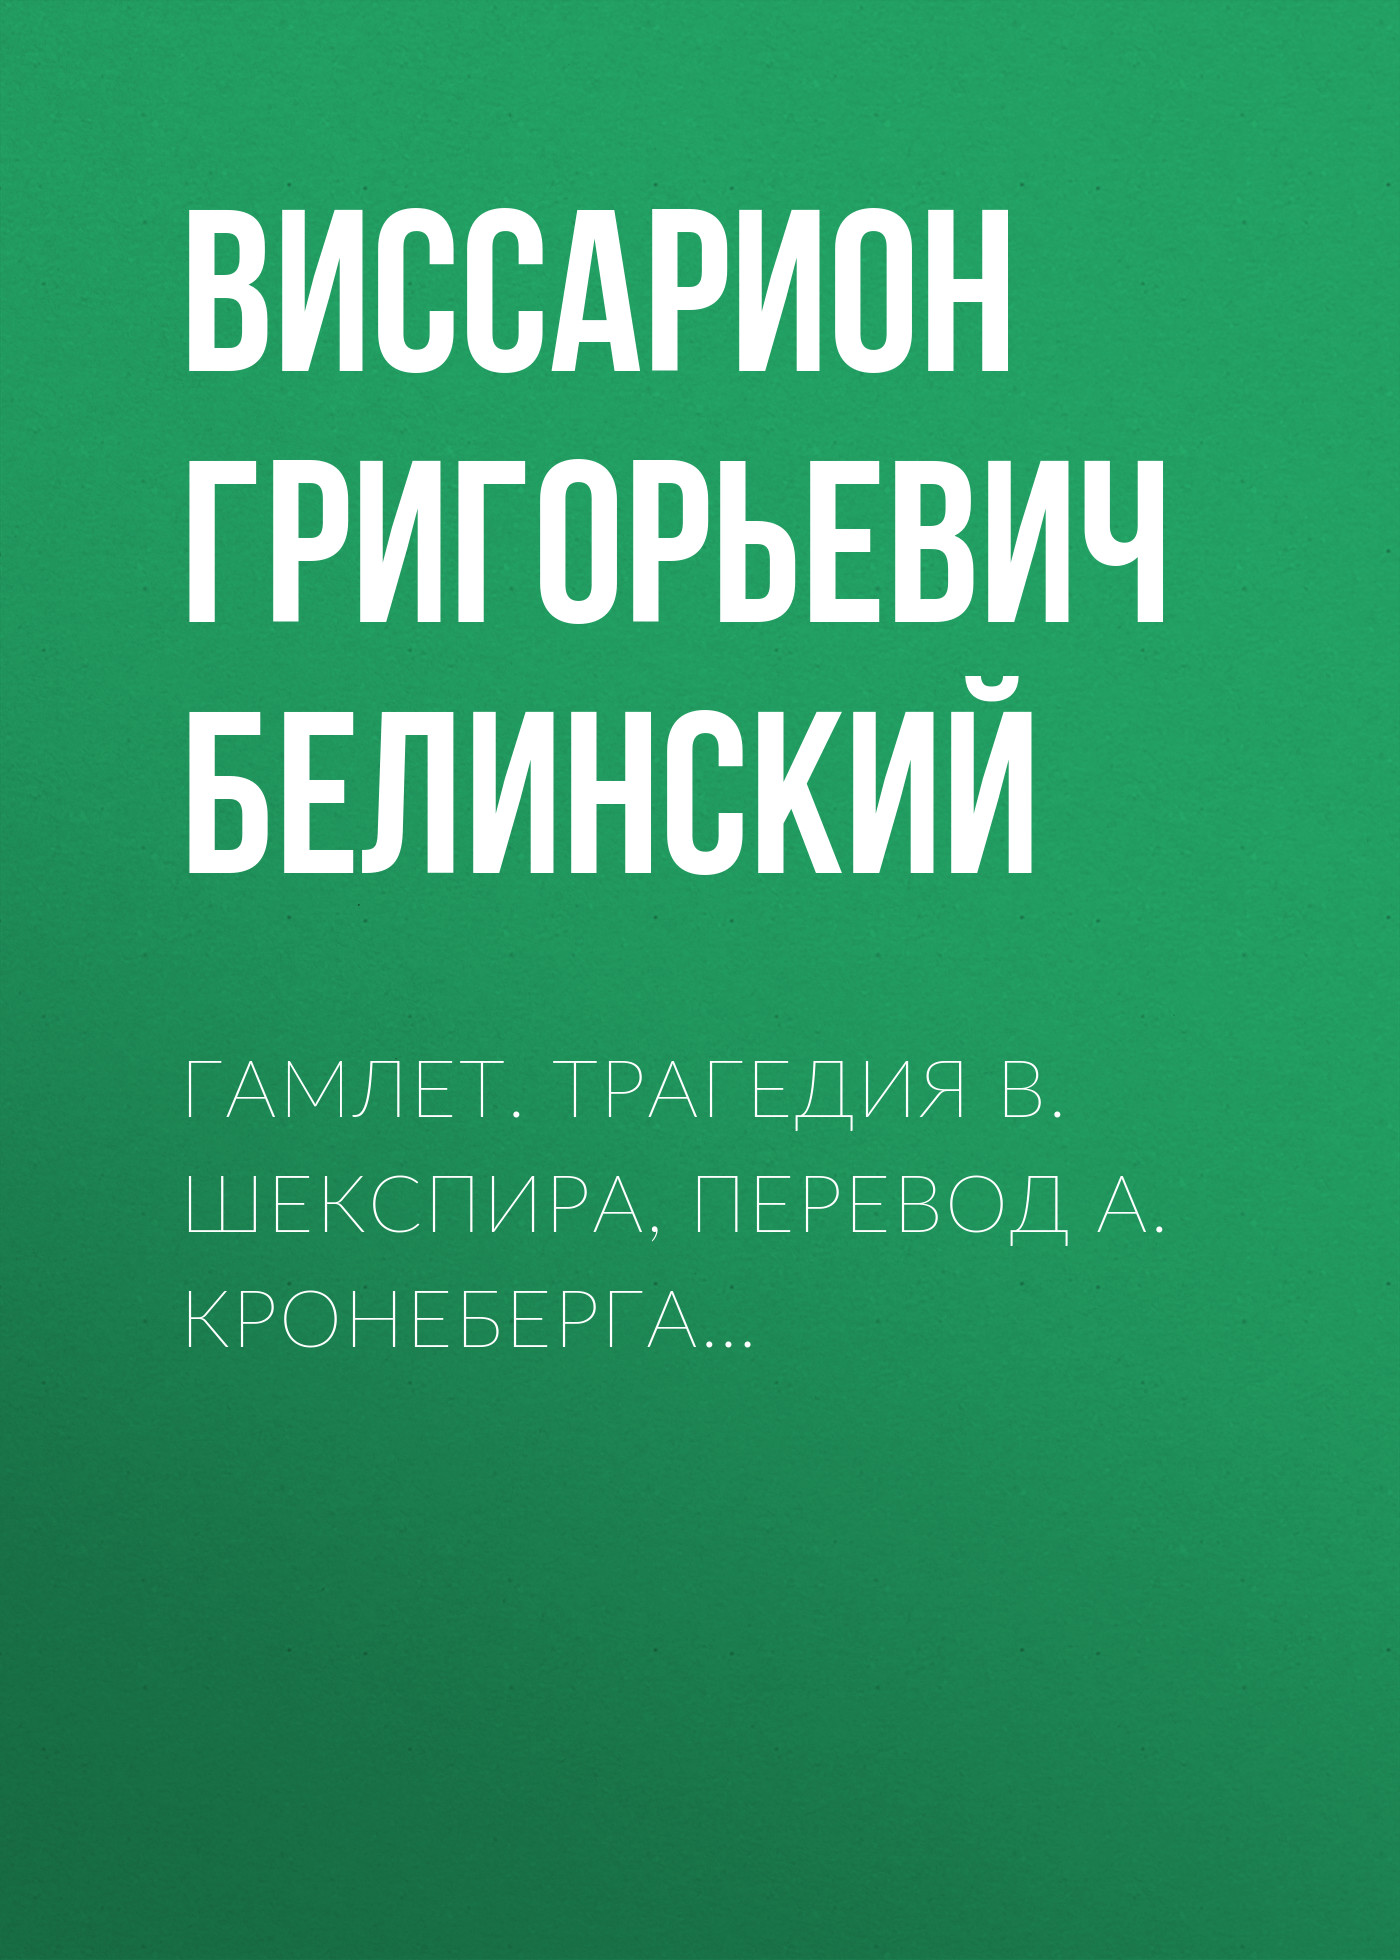 Виссарион Григорьевич Белинский Гамлет. Трагедия В. Шекспира, перевод А. Кронеберга… lacywear dg 207 spl